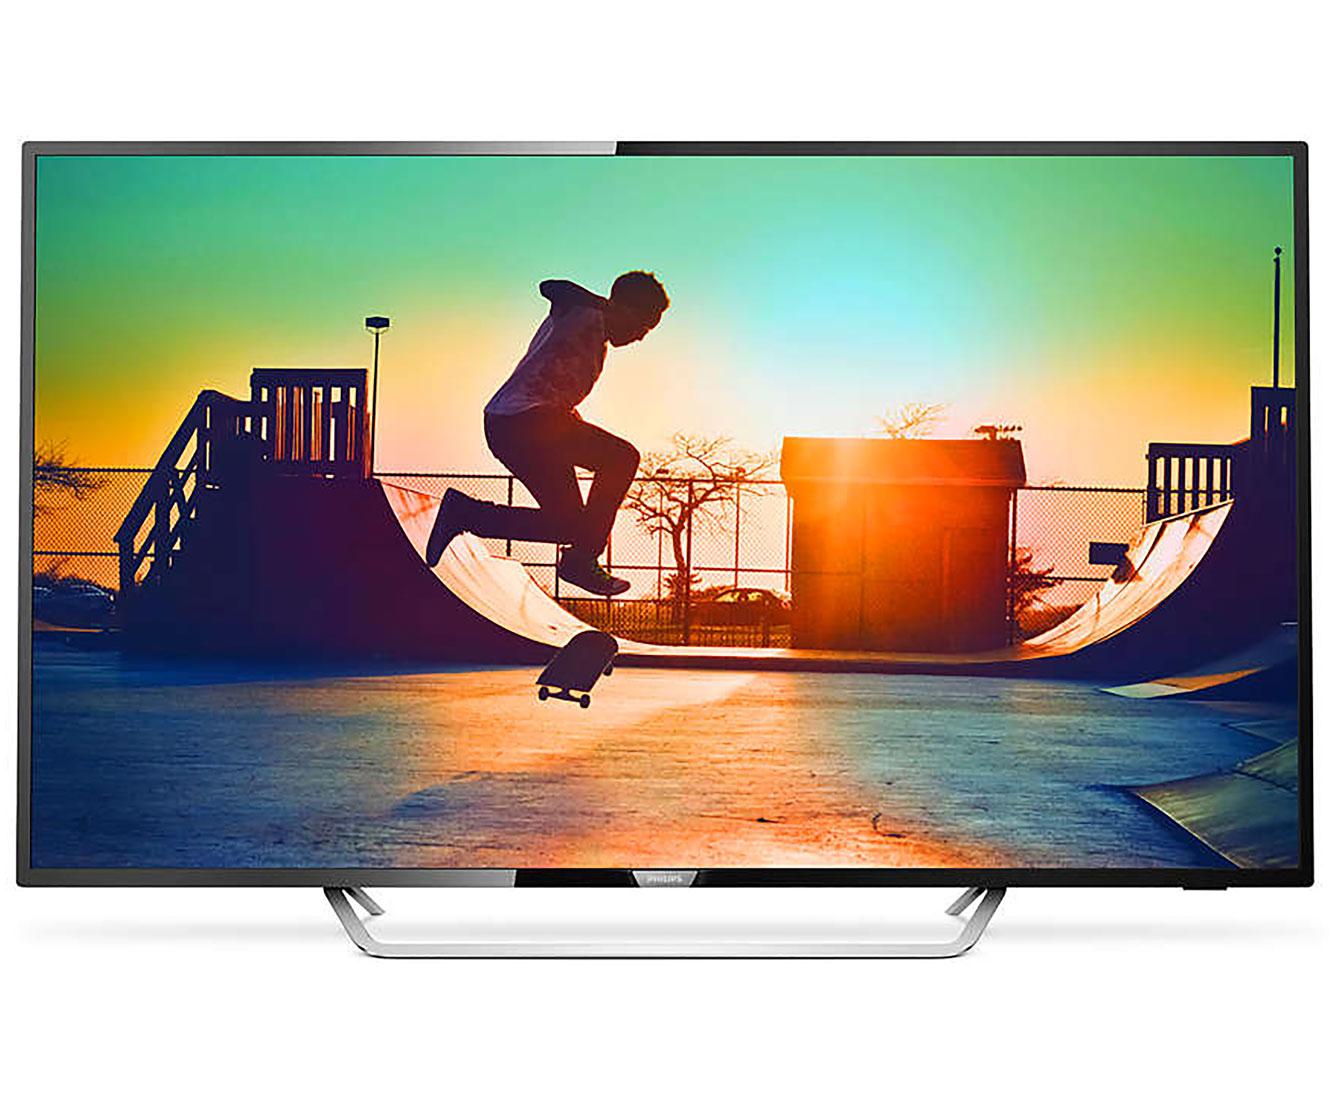 Philips 65PUS6162 4K Ultra HD TV voor €749 na cashback @ AO.nl